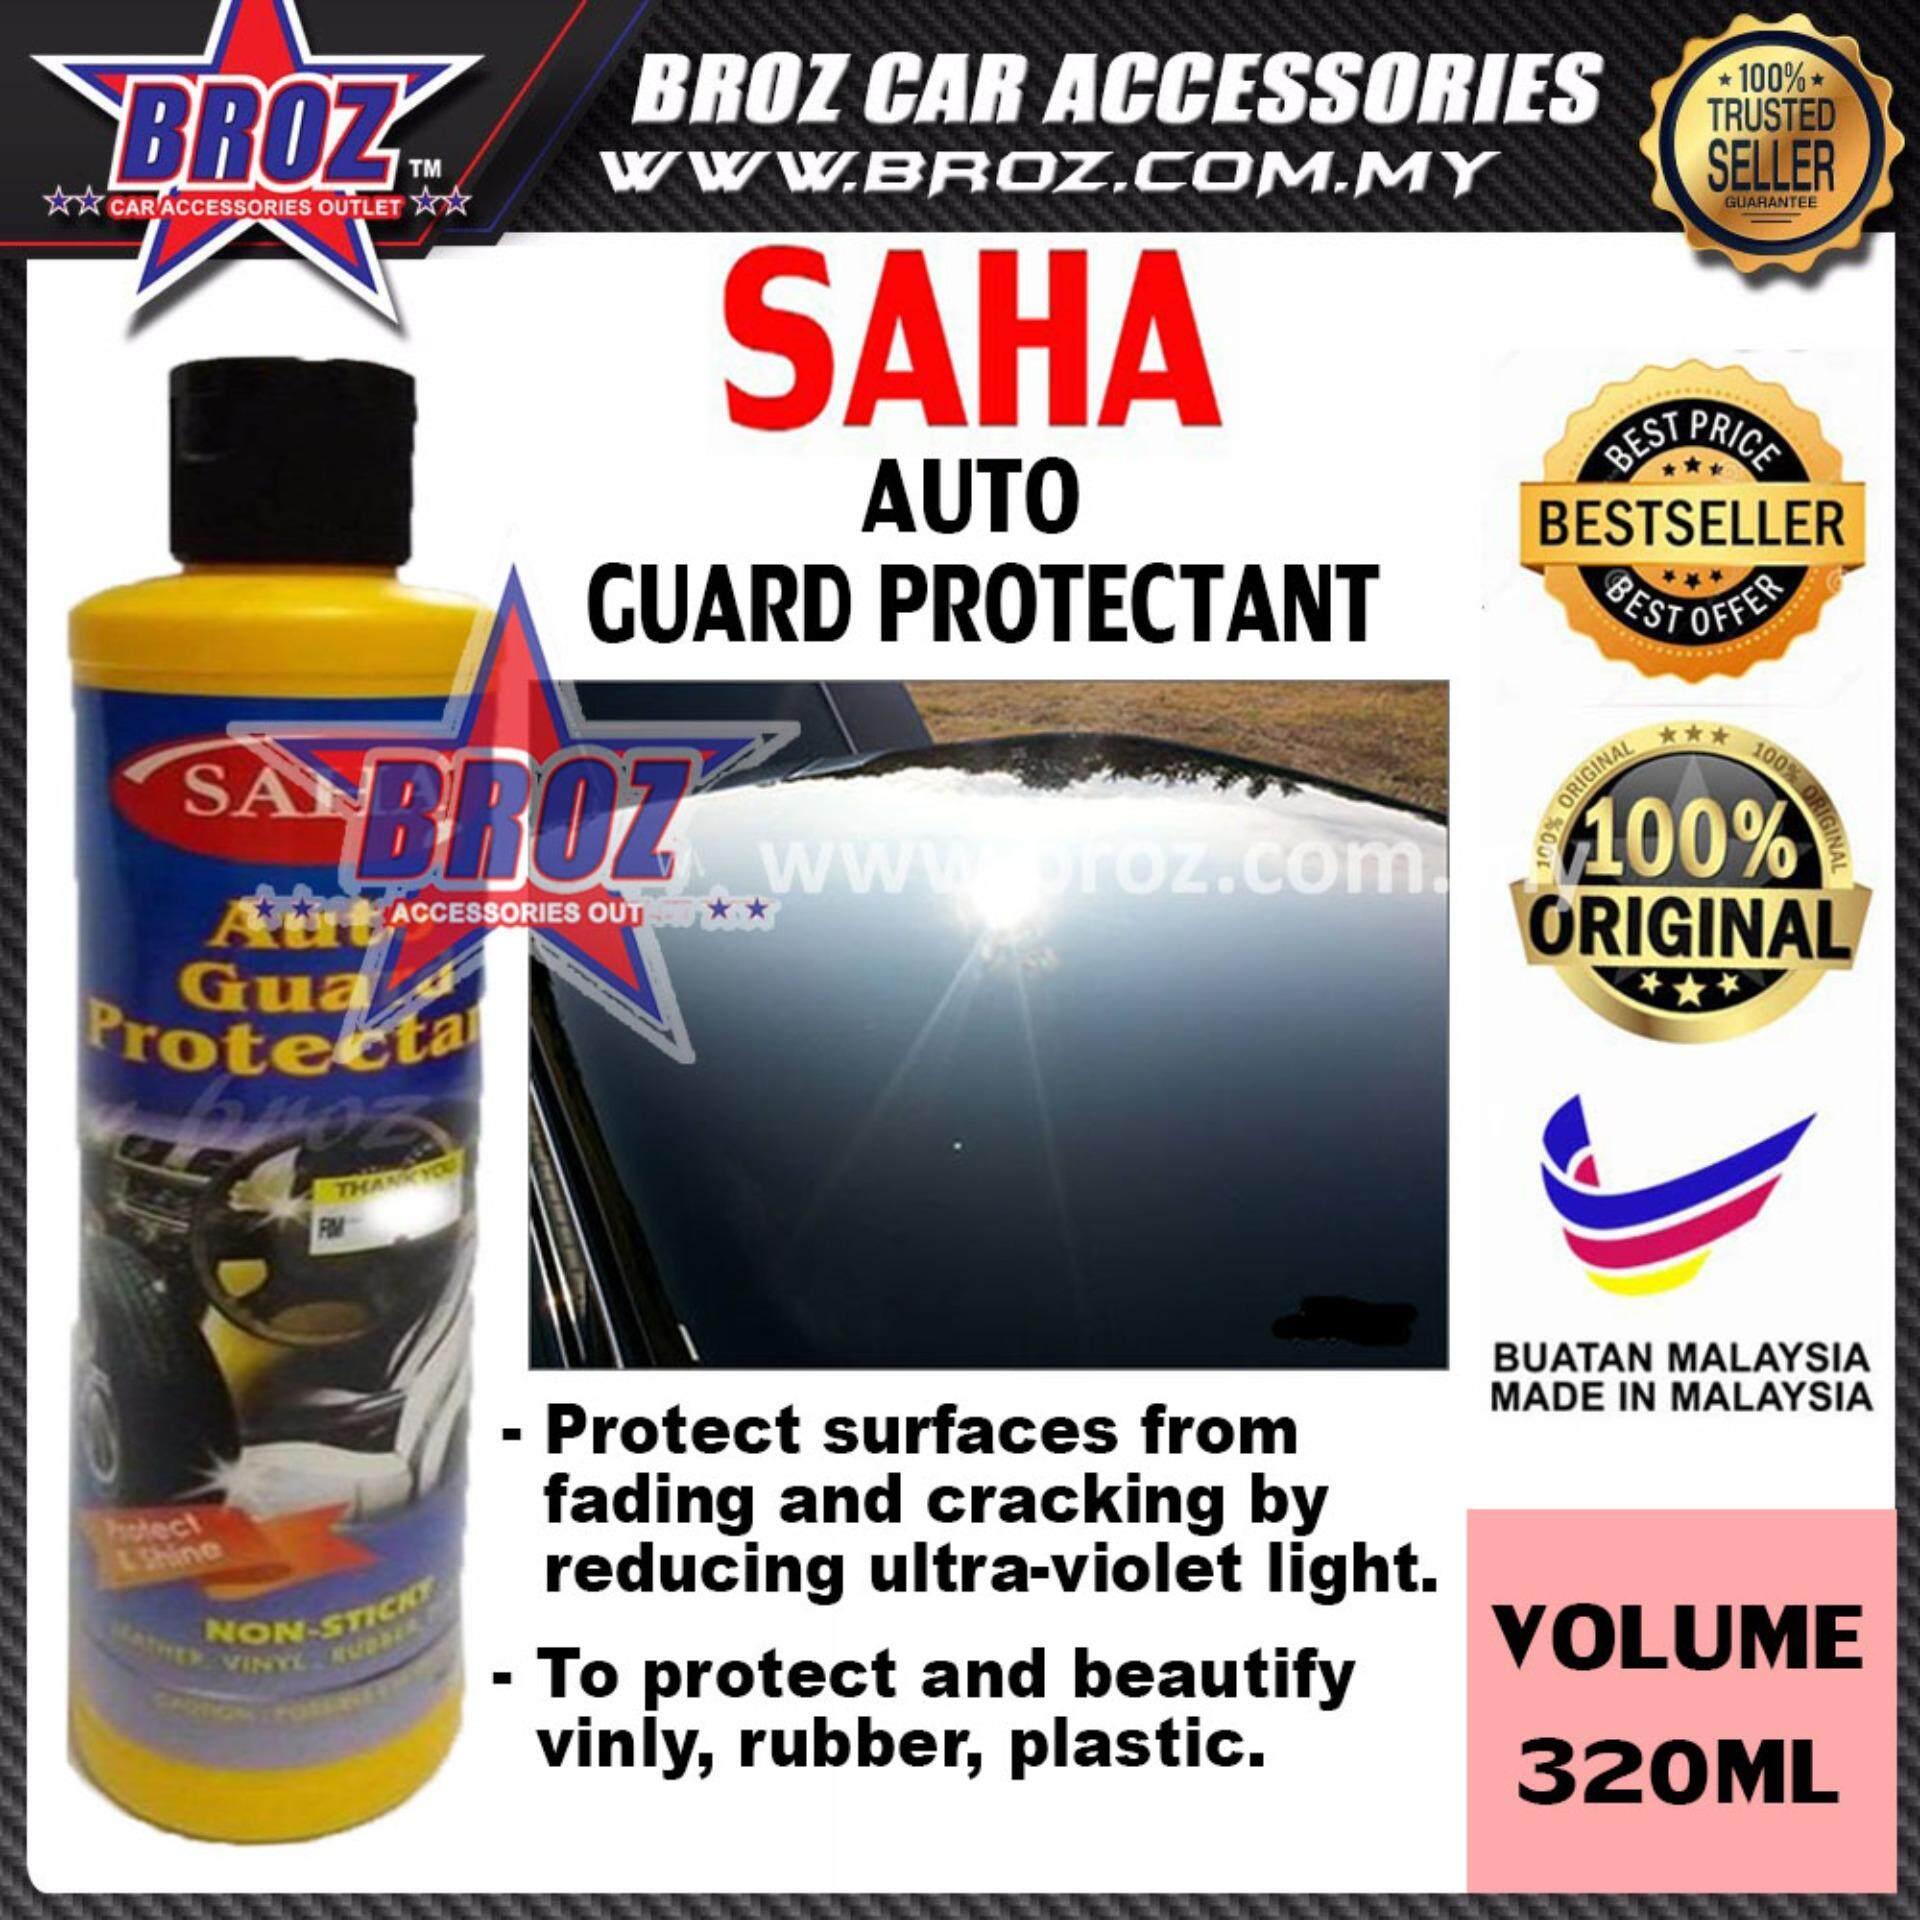 SAHA Auto Guard Protectant Non-Sticky Protect & Shine 320ML